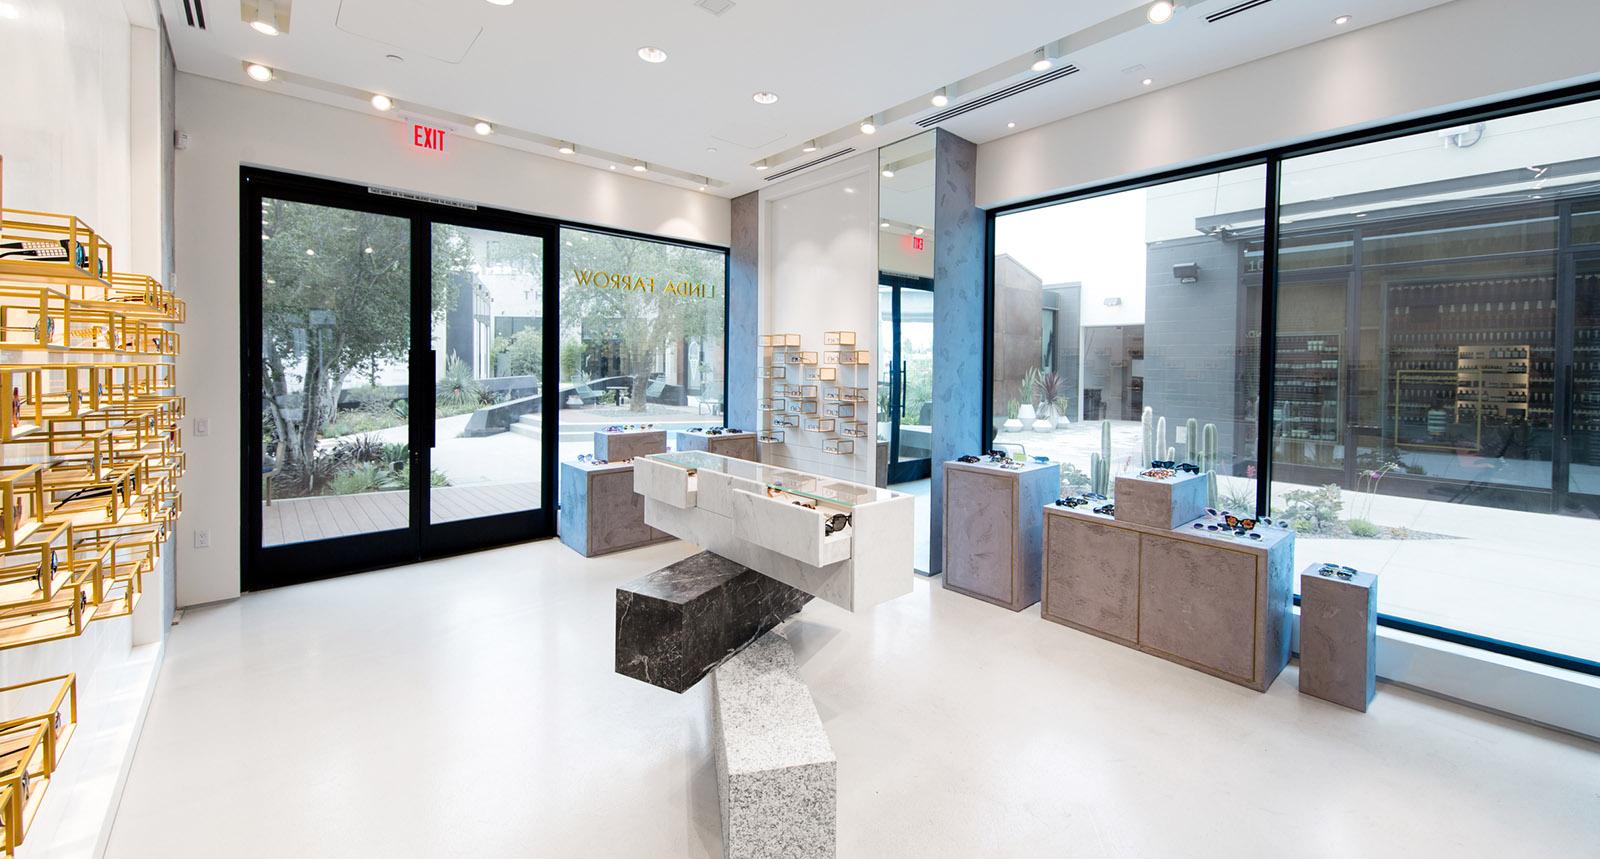 Store Interior View